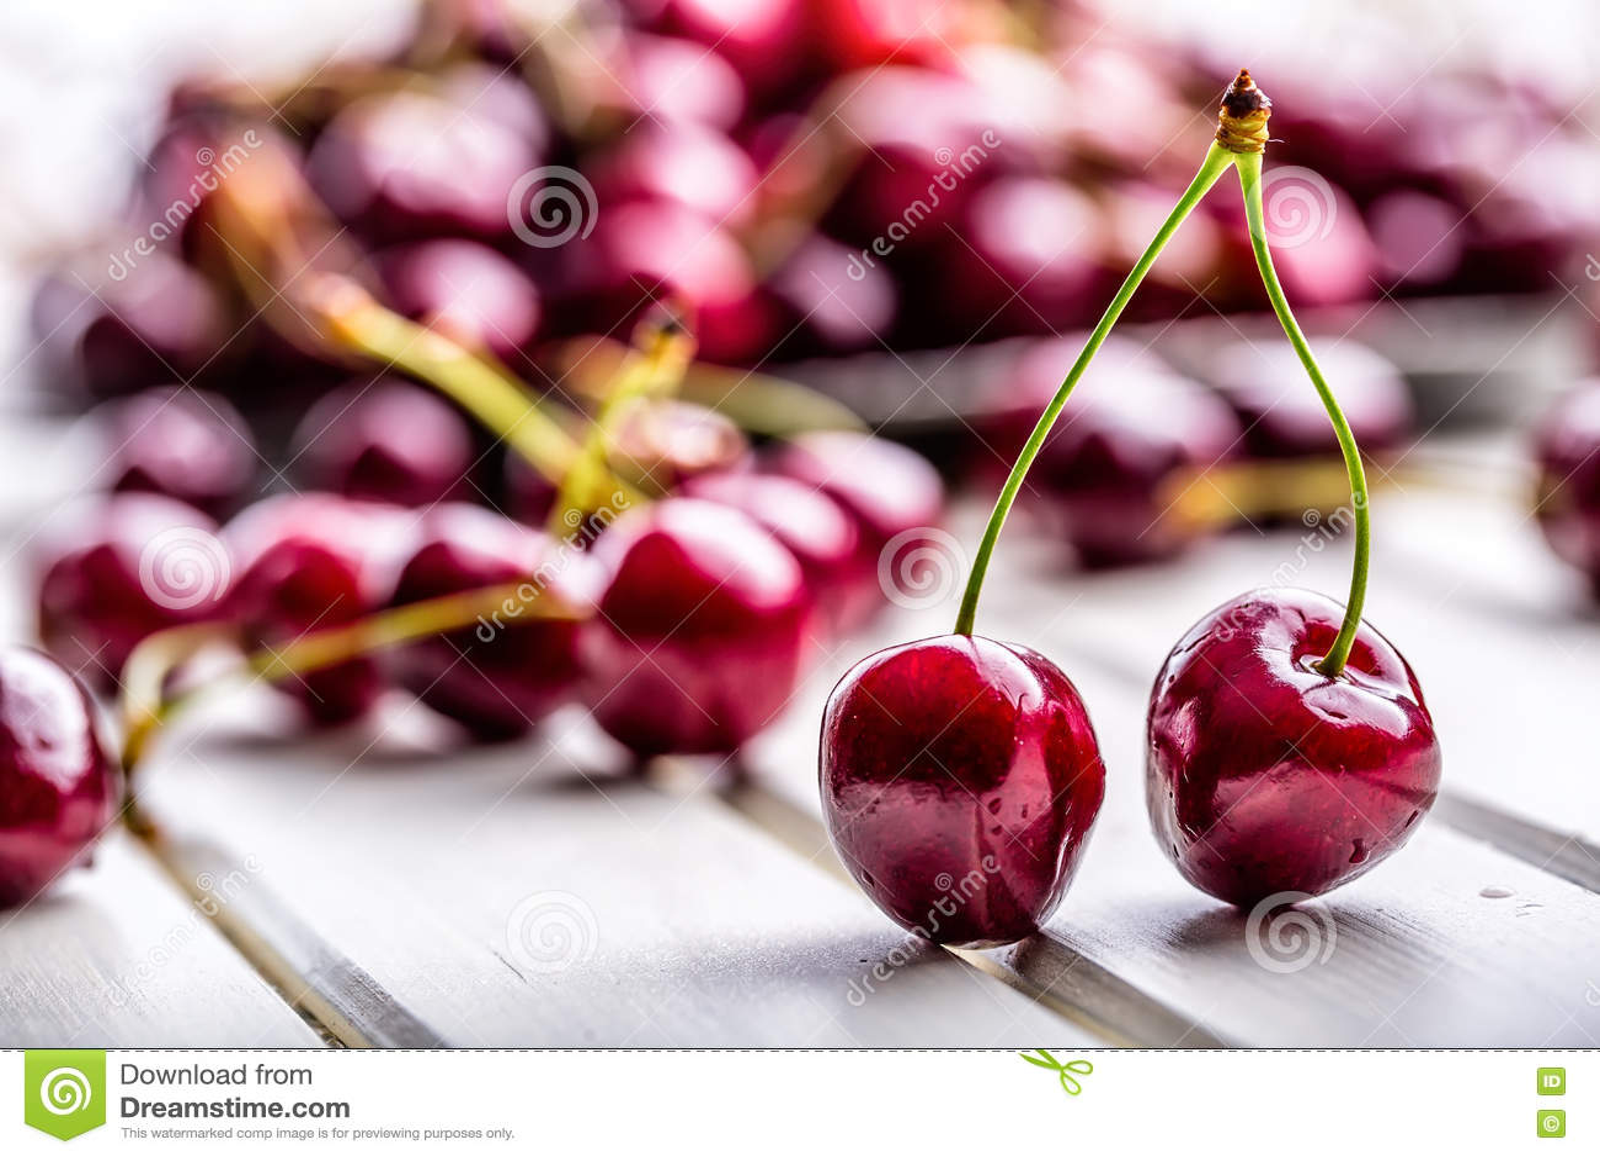 Cherries. Sweet Cherries. Fresh Cherries. Ripe cherries on wooden concrete table - board